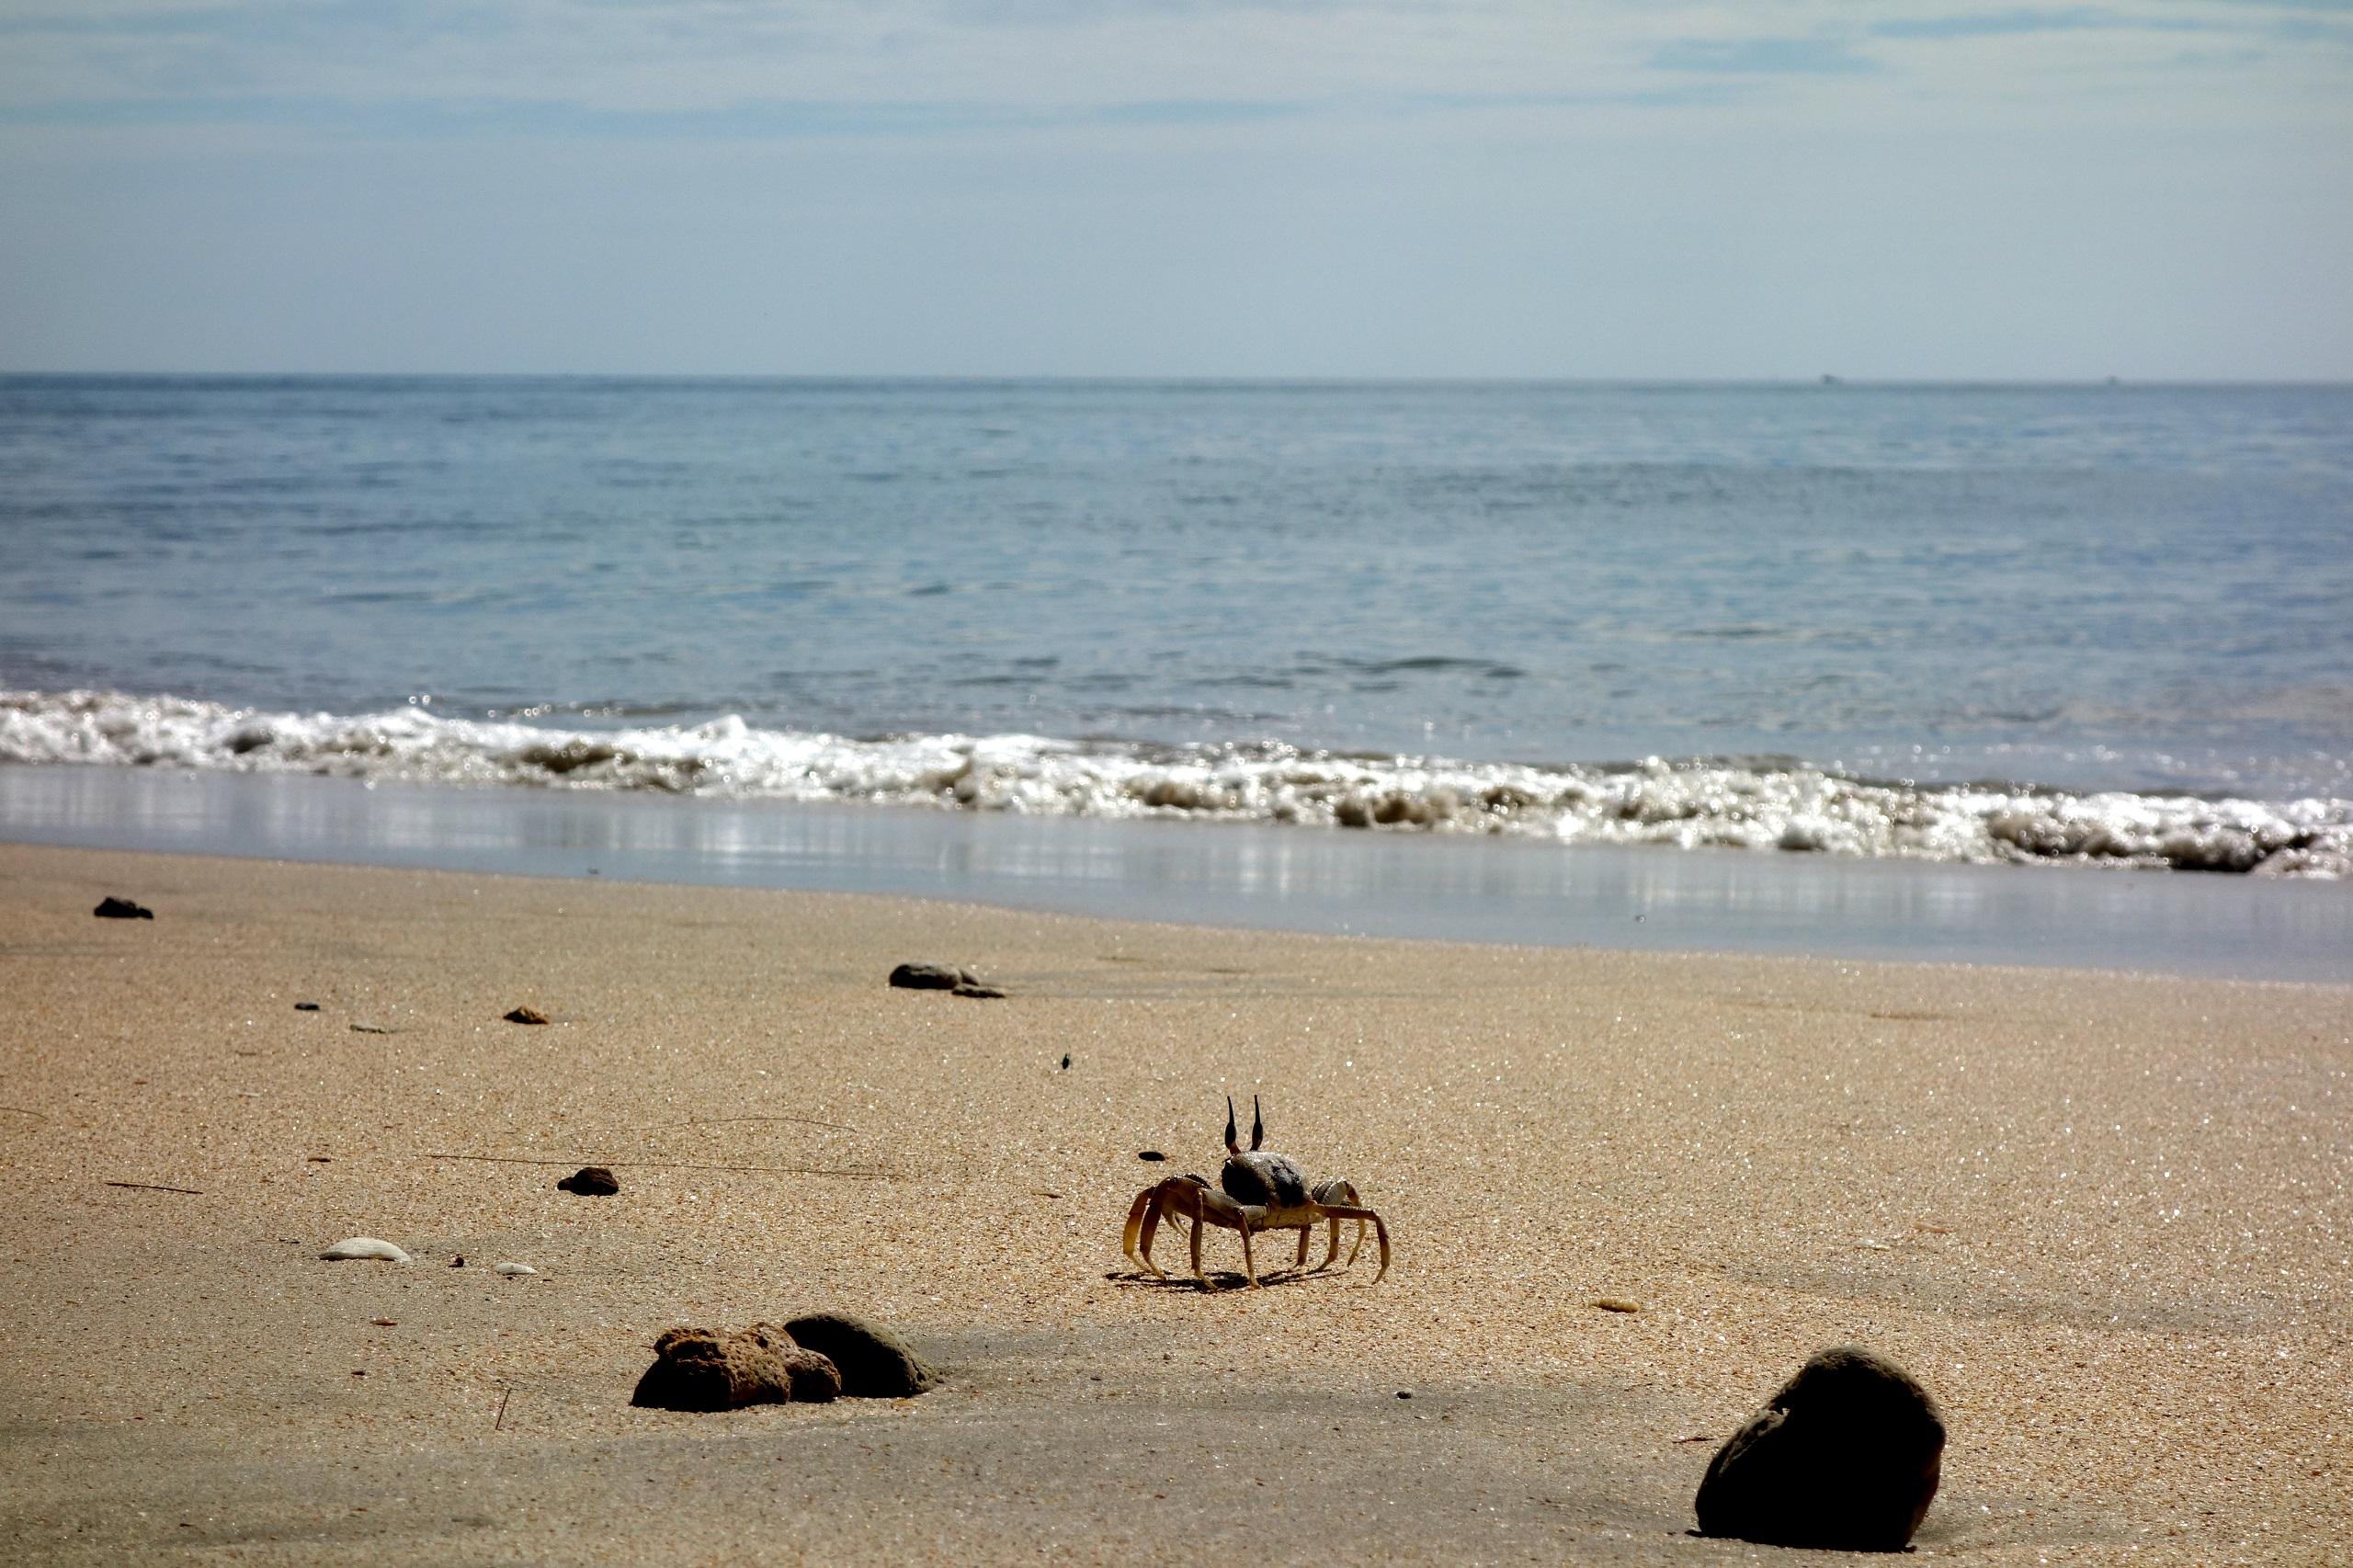 Wyspa Koh Jum - Tajlandia - mieszkaniec wyspy Pan krab :)